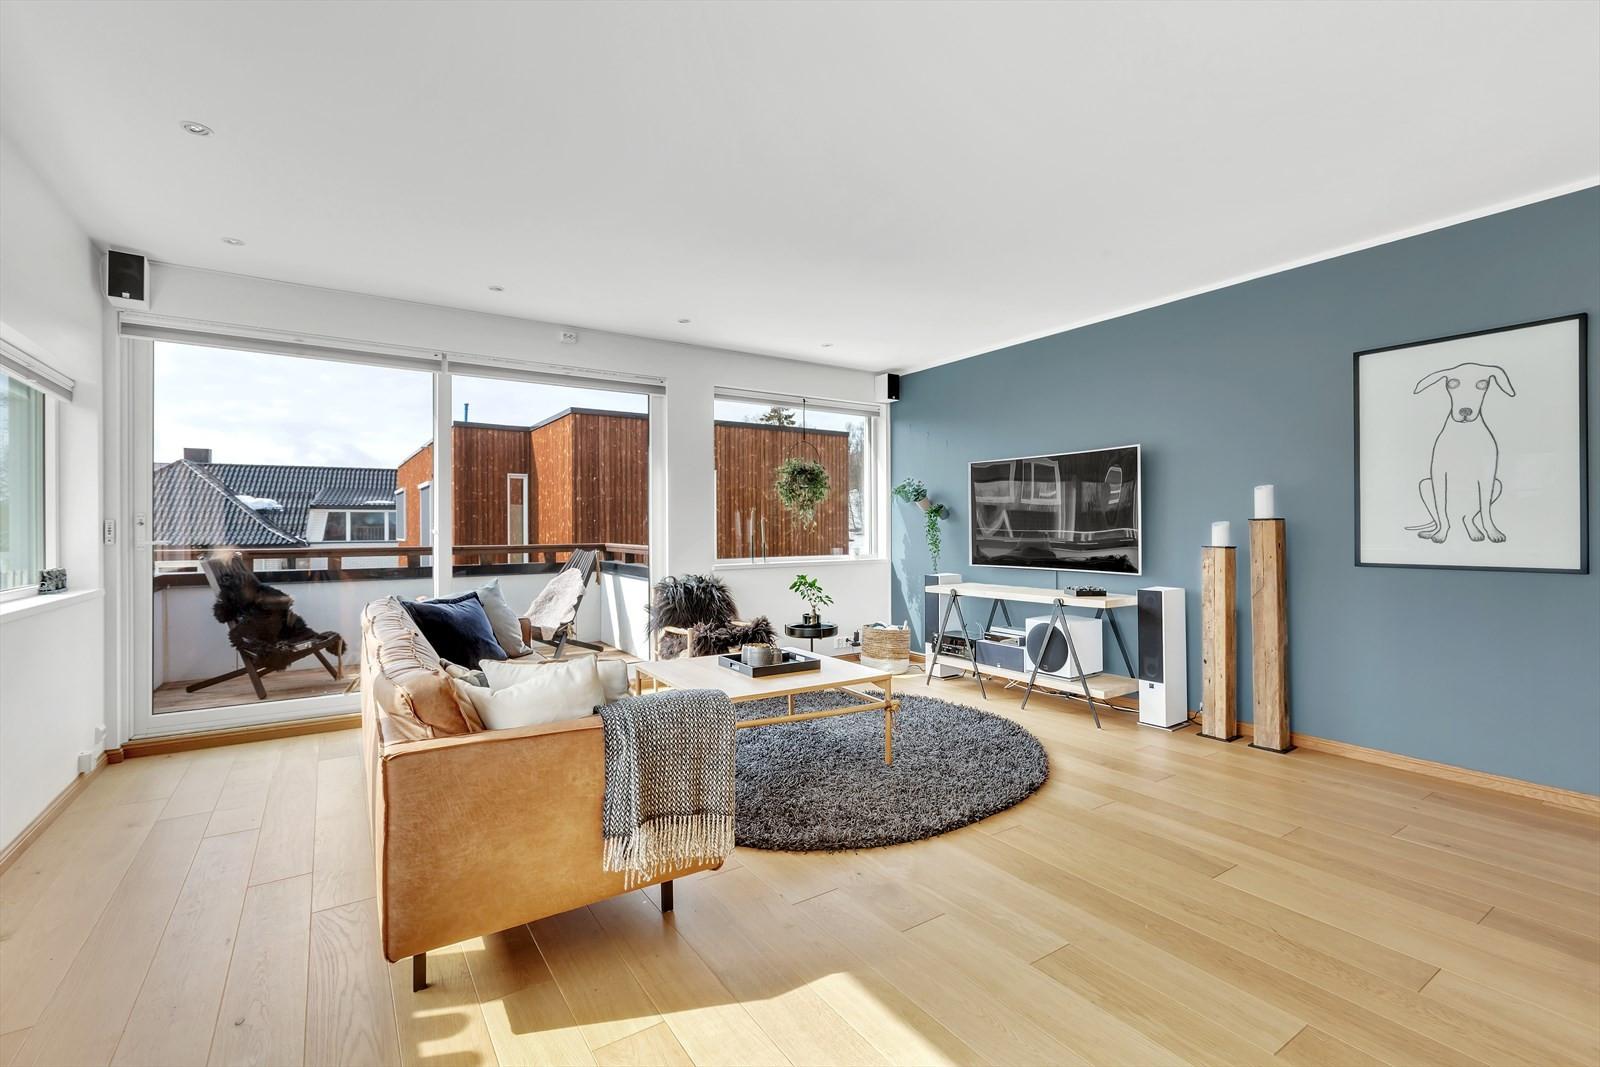 God plass til møblement i dagligstuen. Herfra er det utgang til sørvendt veranda